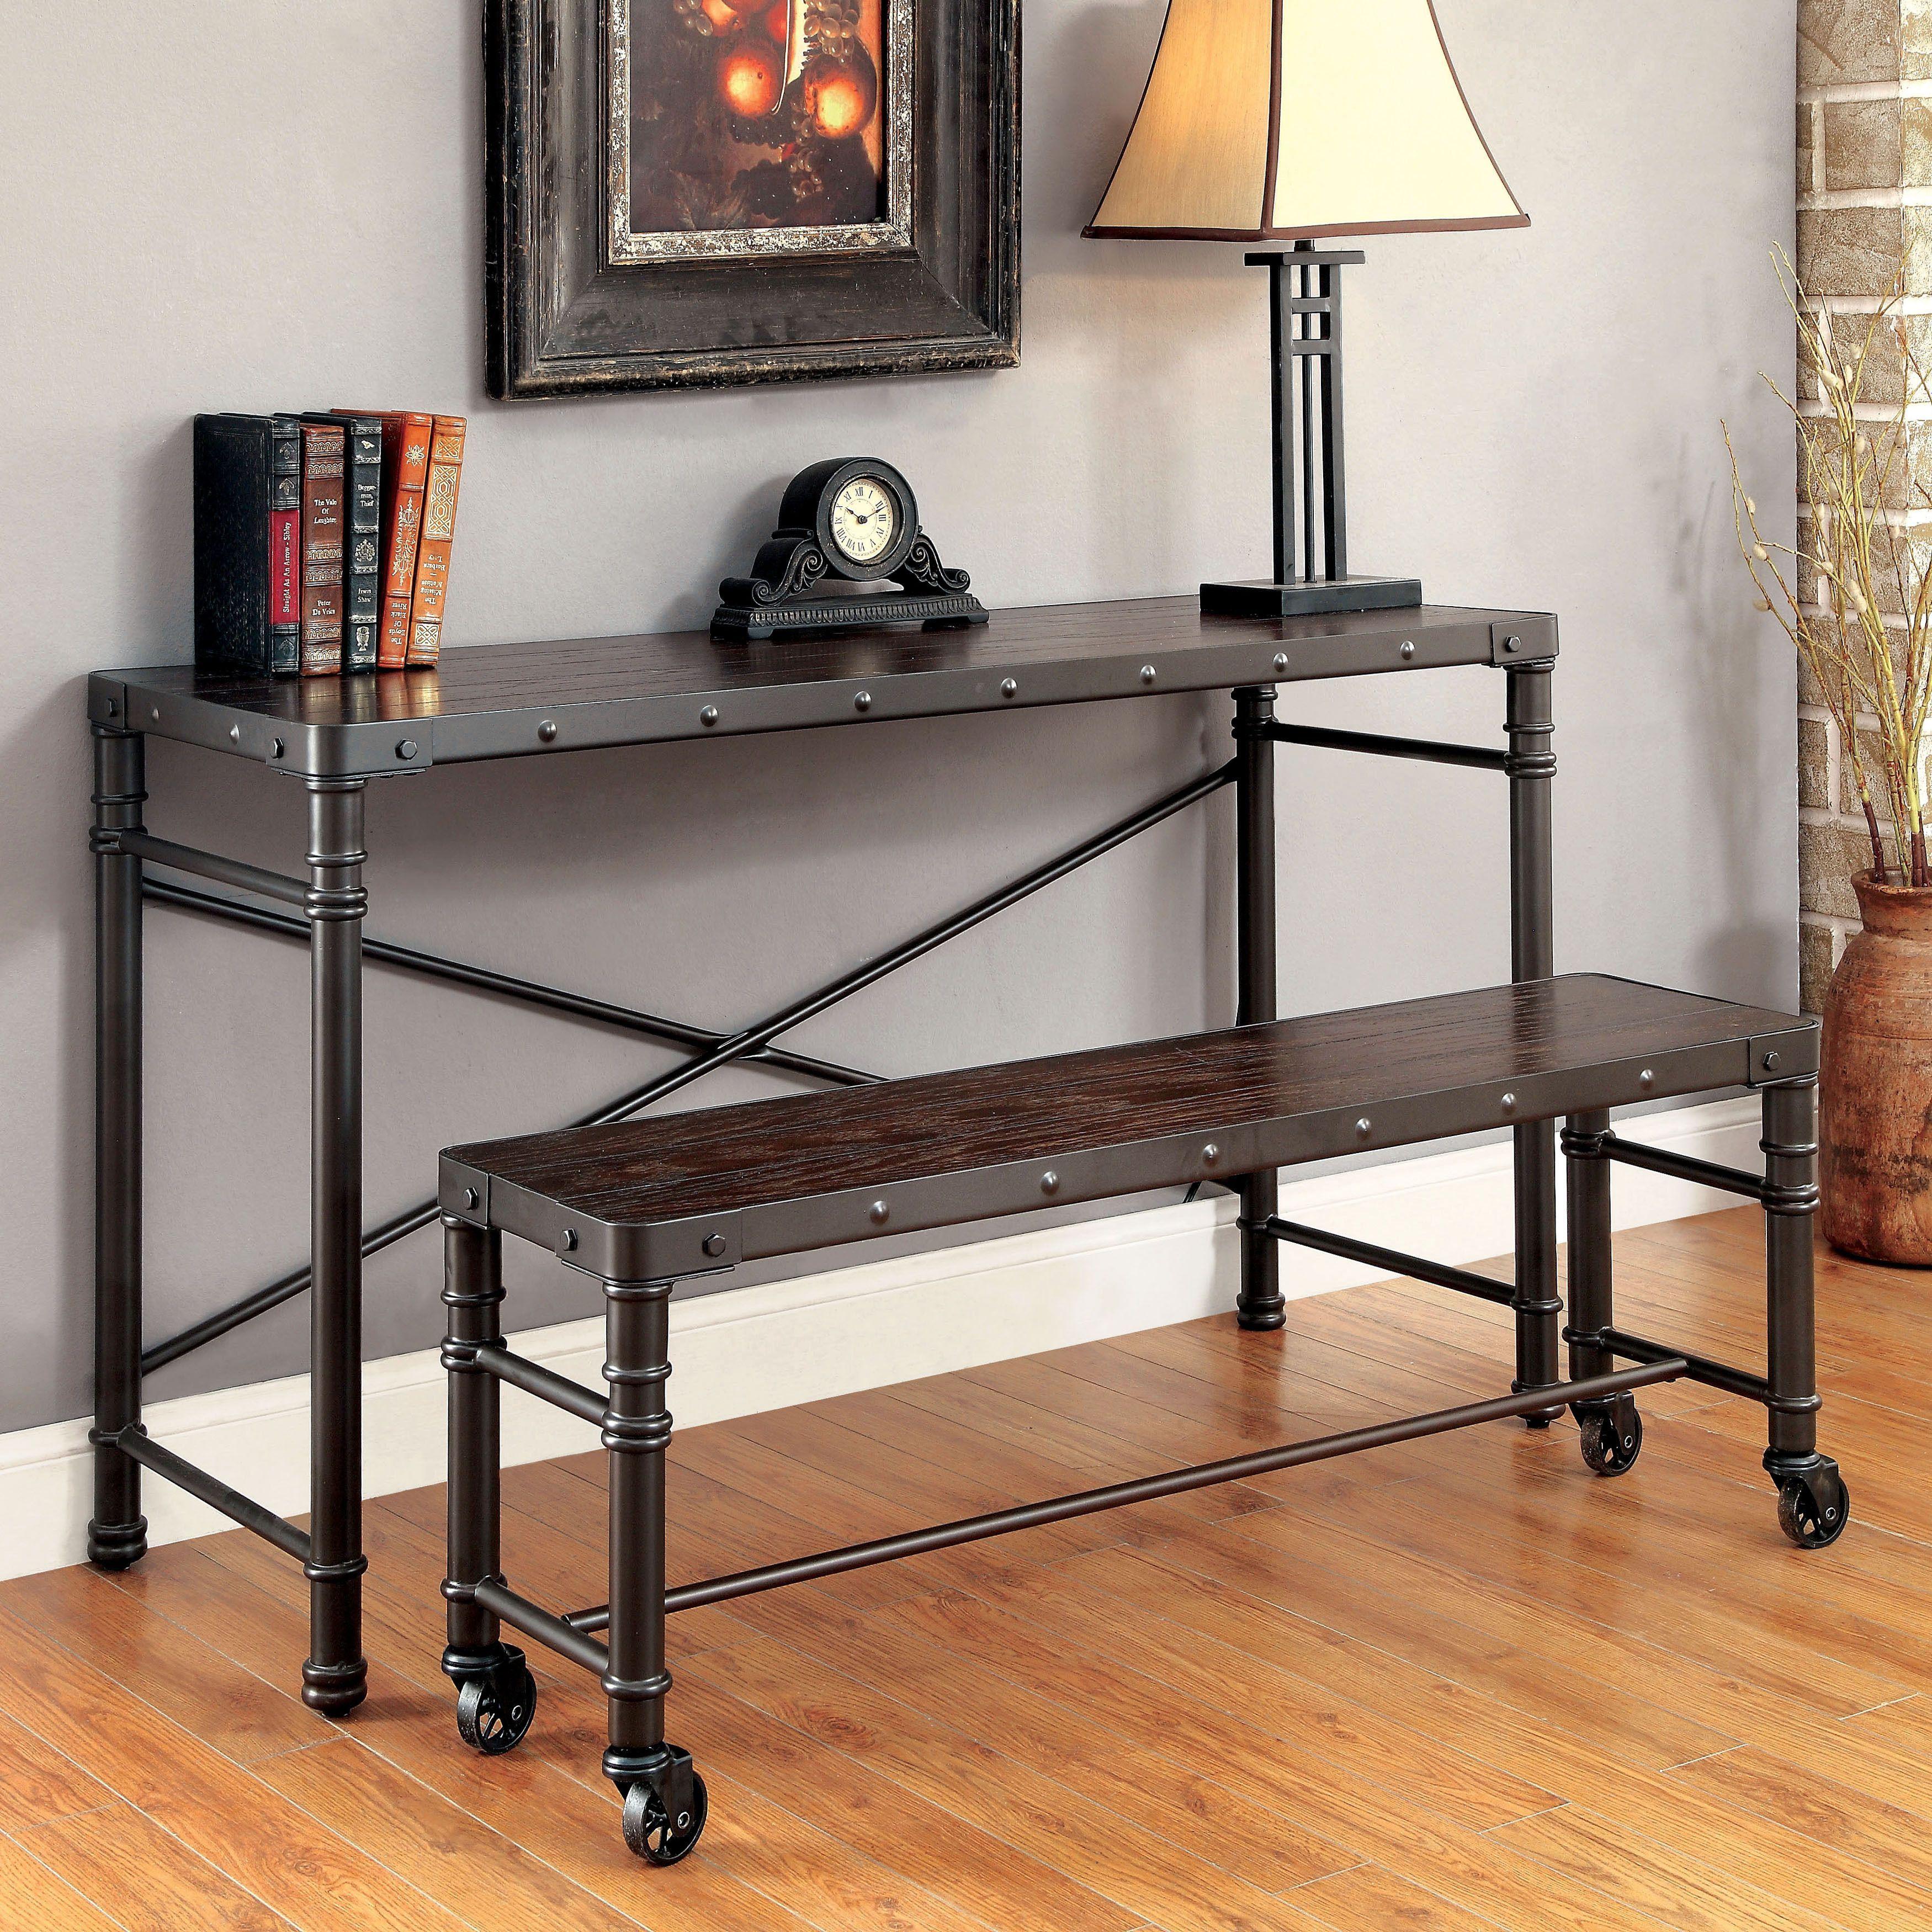 Furniture Of America Stevens Industrial Steampunk Metal 46 Inch Bench